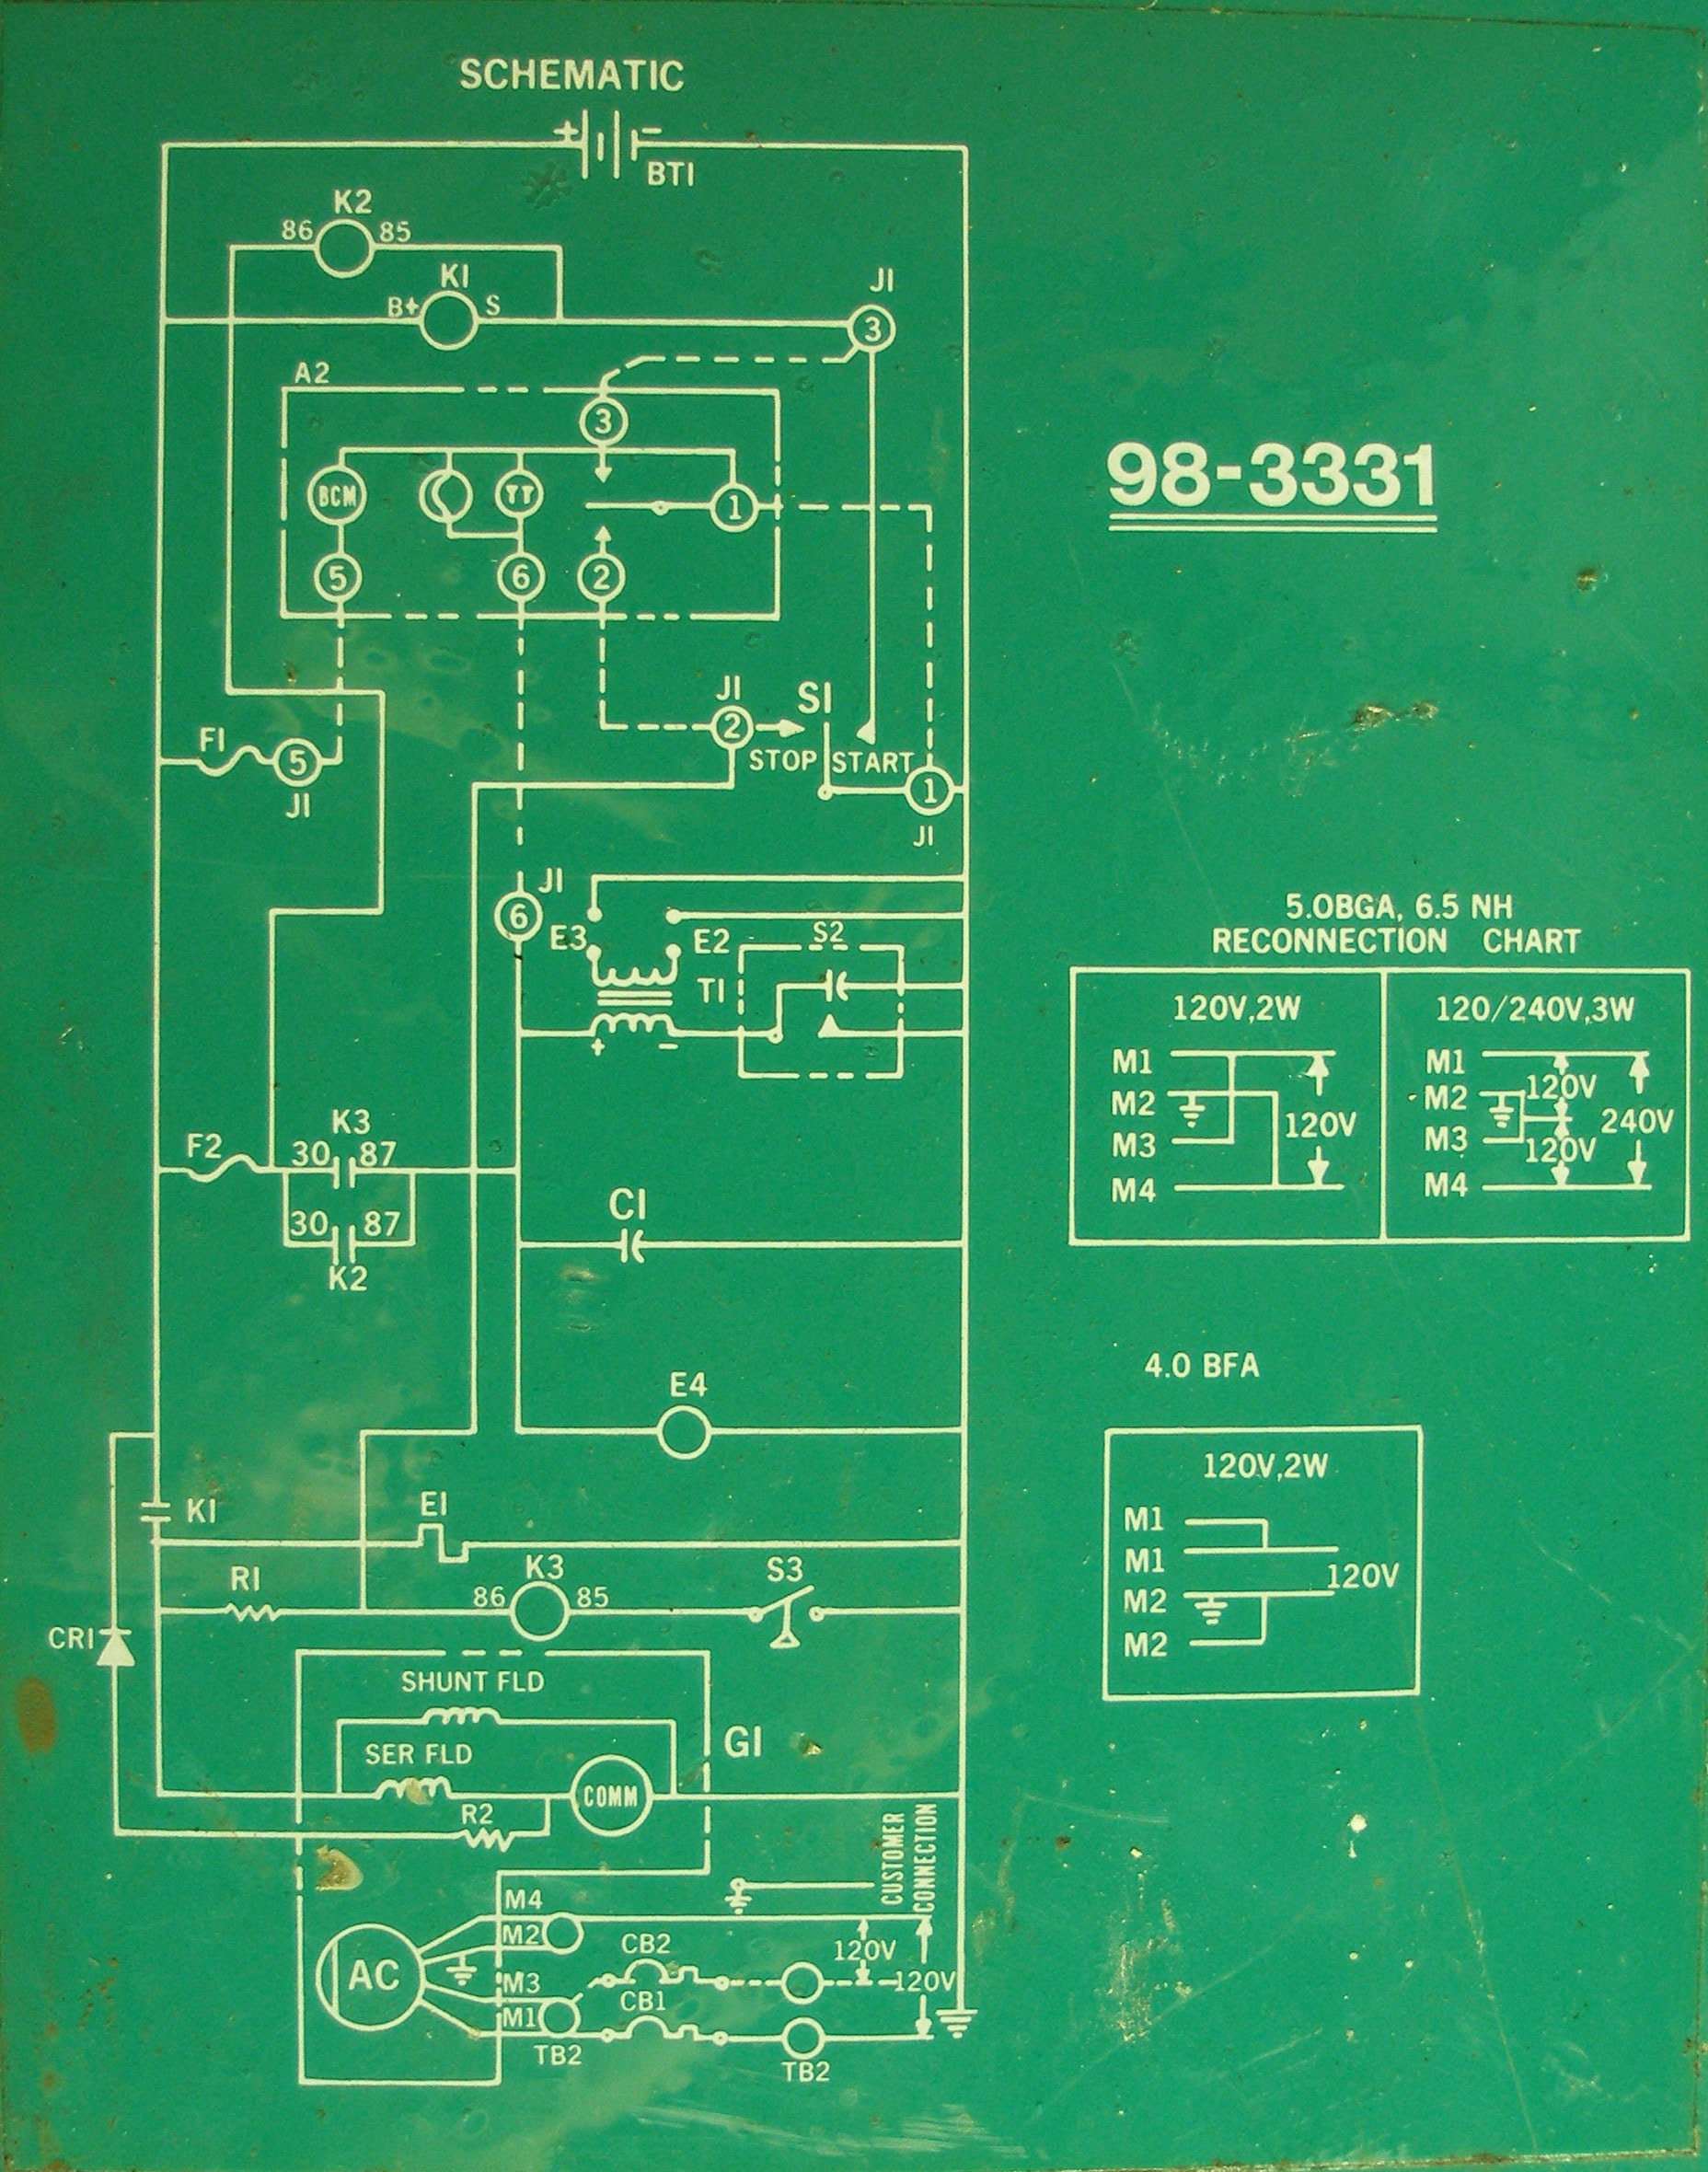 [DIAGRAM_38DE]  DIAGRAM] Onan Homesite 6500 Generator Wiring Diagram FULL Version HD  Quality Wiring Diagram - MG50DFXSCHEMATIC4215.CONTRABBASSIVERDIANI.IT | Onan Homesite 6500 Generator Wiring Diagram |  | Contrabbassi di Simone e Damiano Verdiani